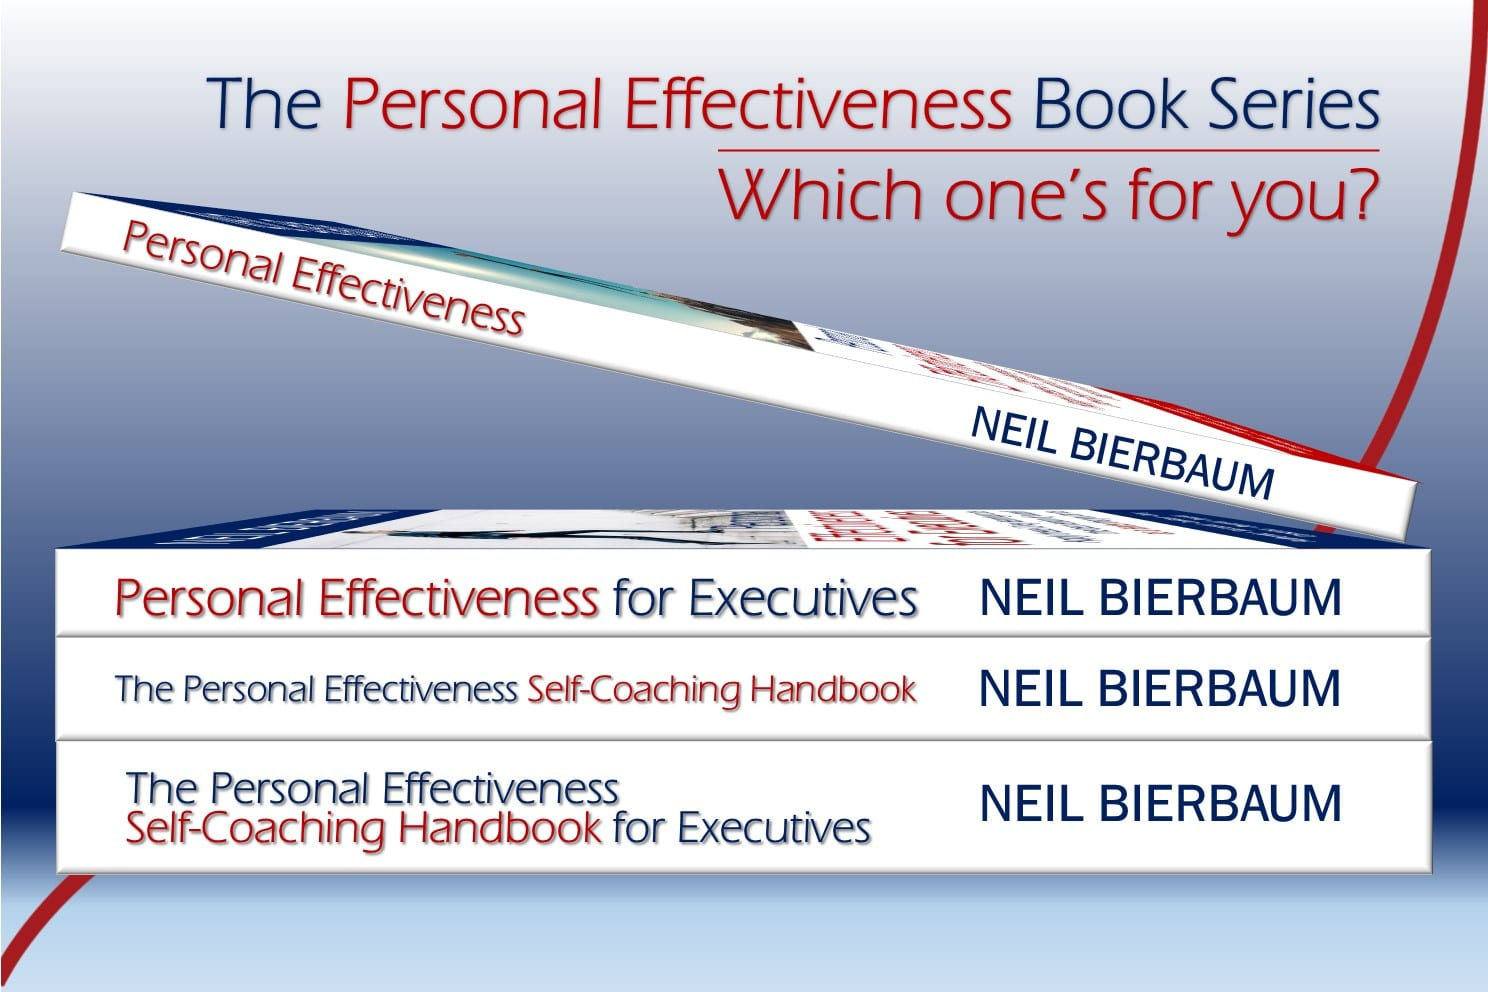 personal effectiveness book series neil bierbaum